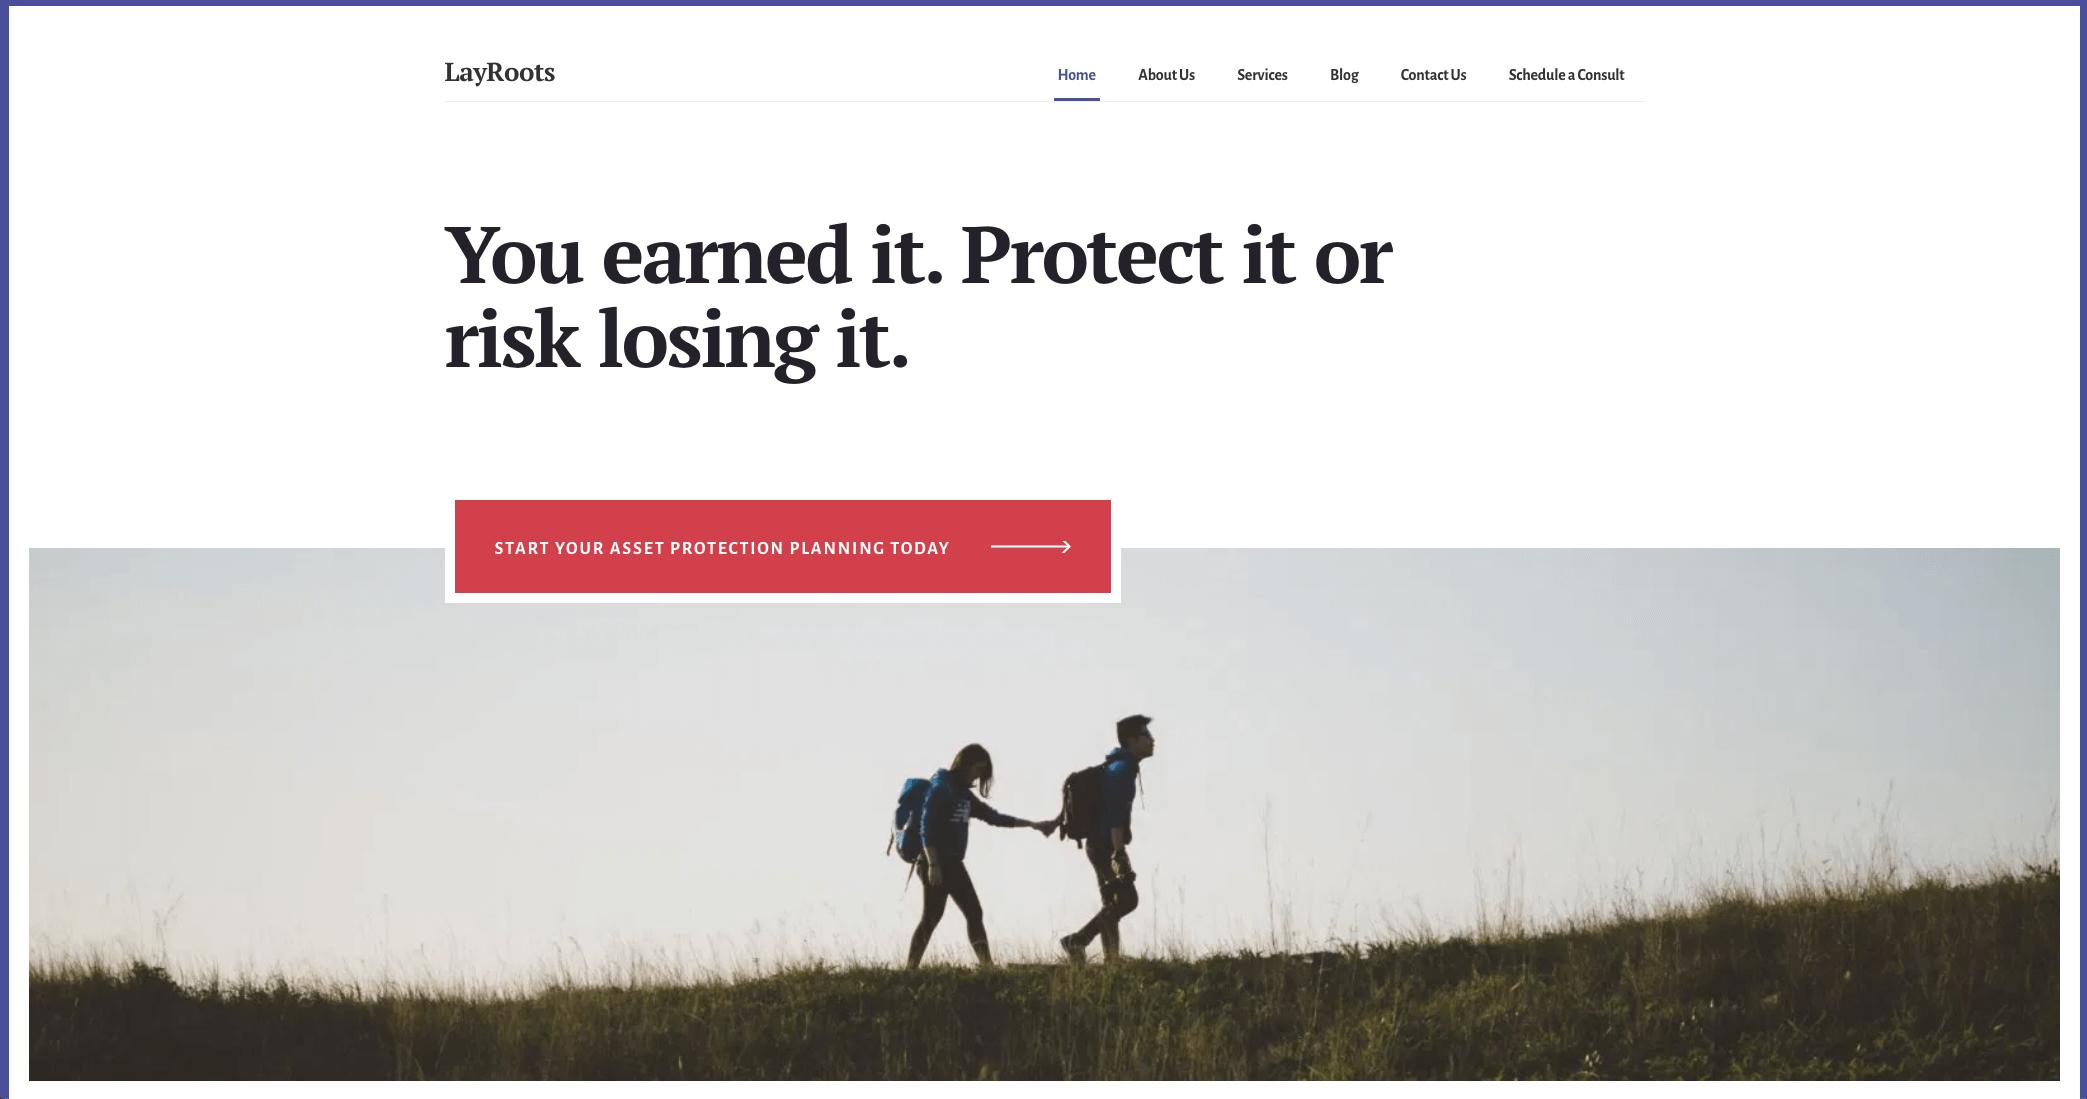 LayRoots website